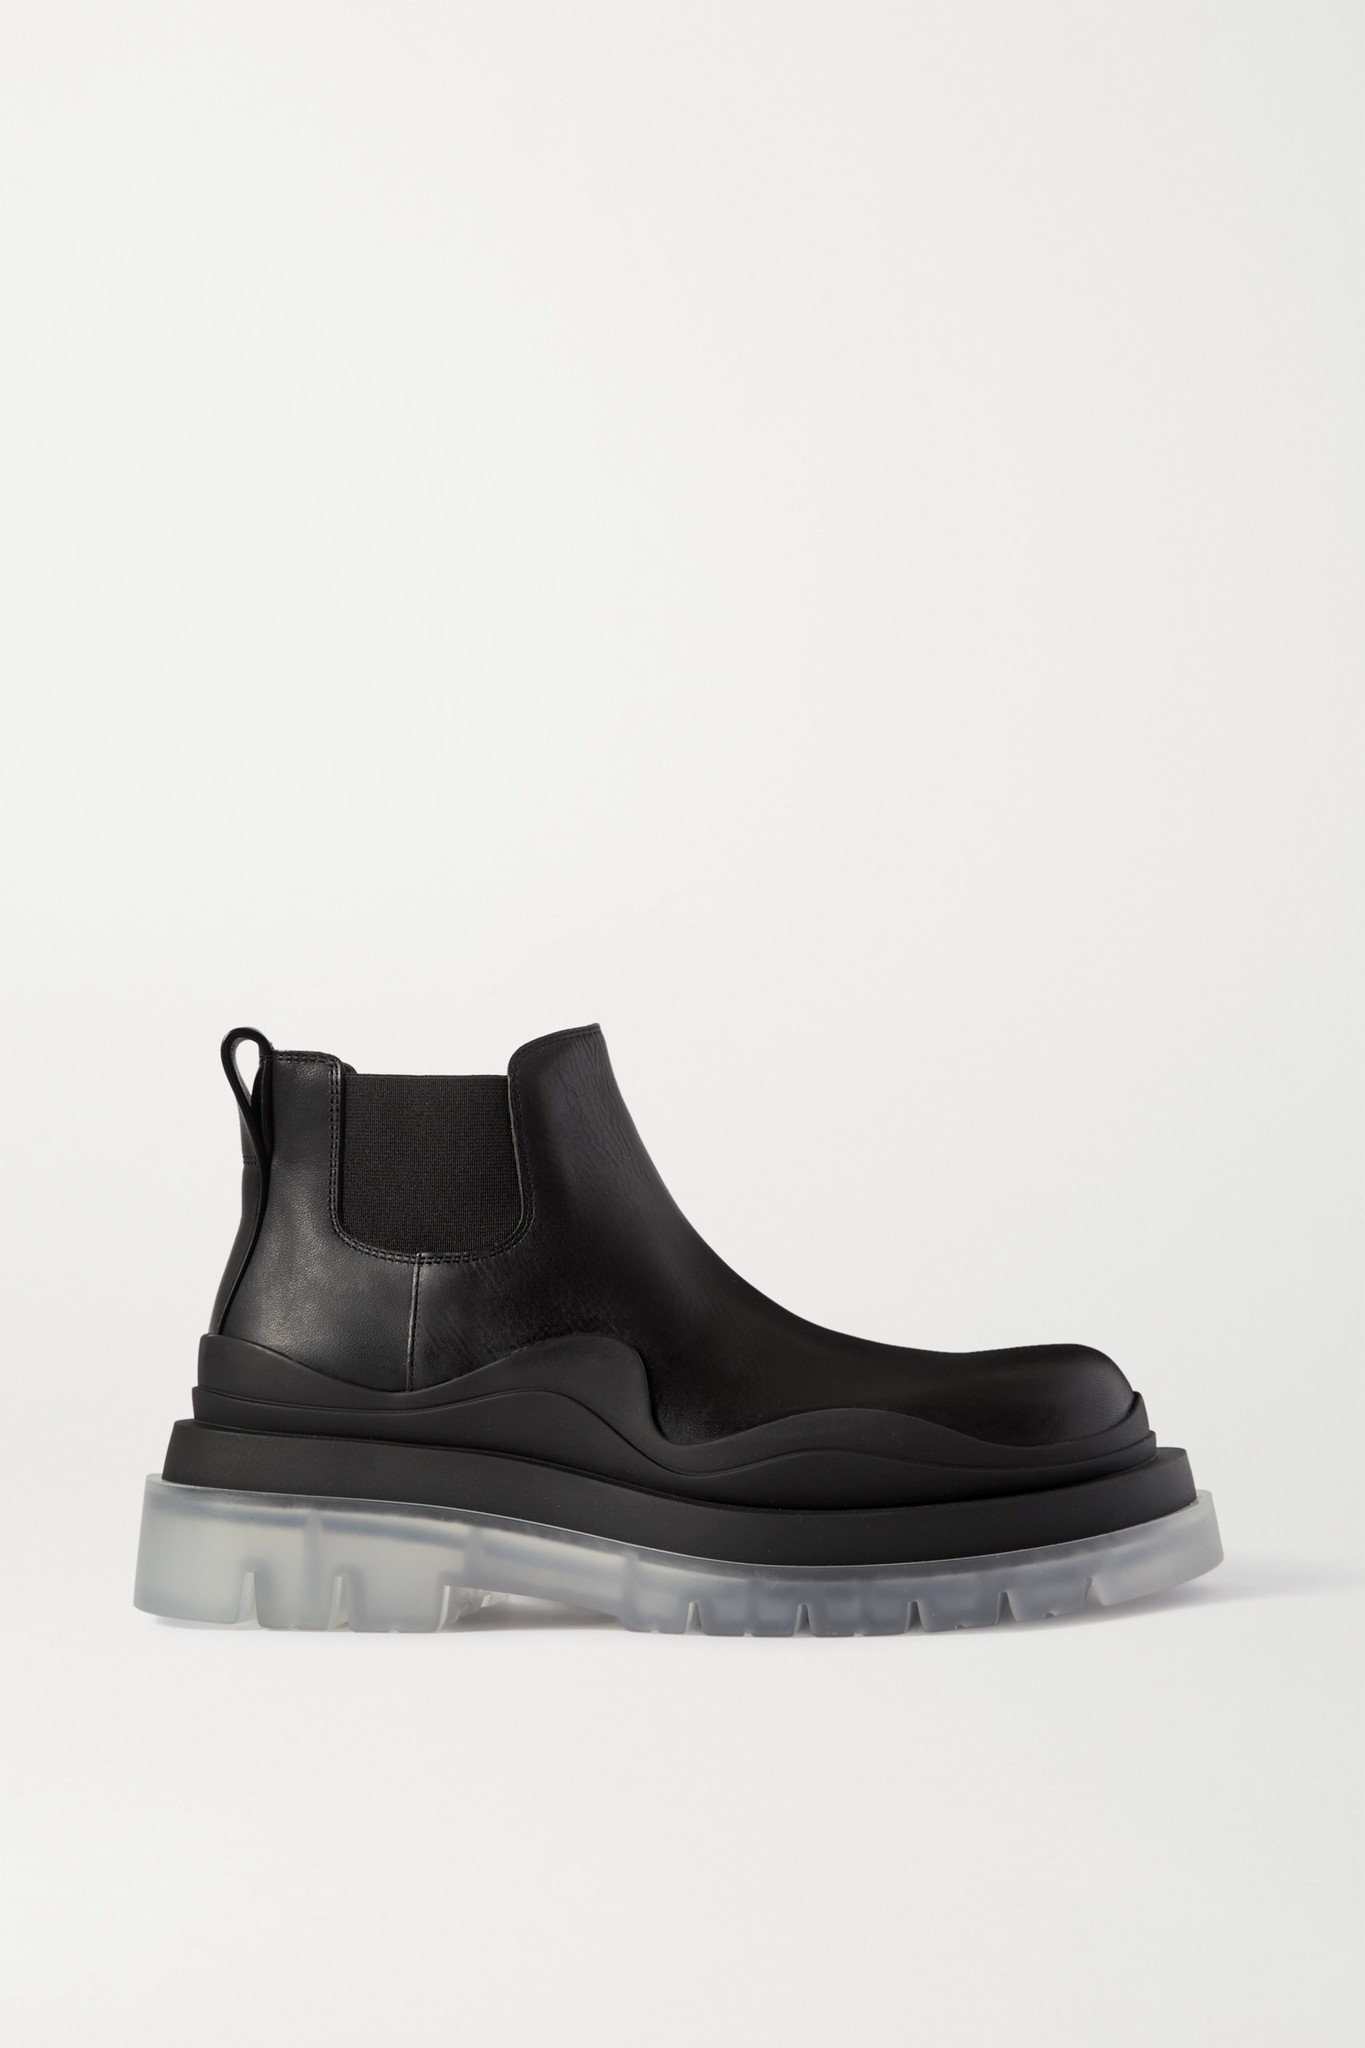 BOTTEGA VENETA - Rubber-trimmed Leather Chelsea Boots - Black - IT34